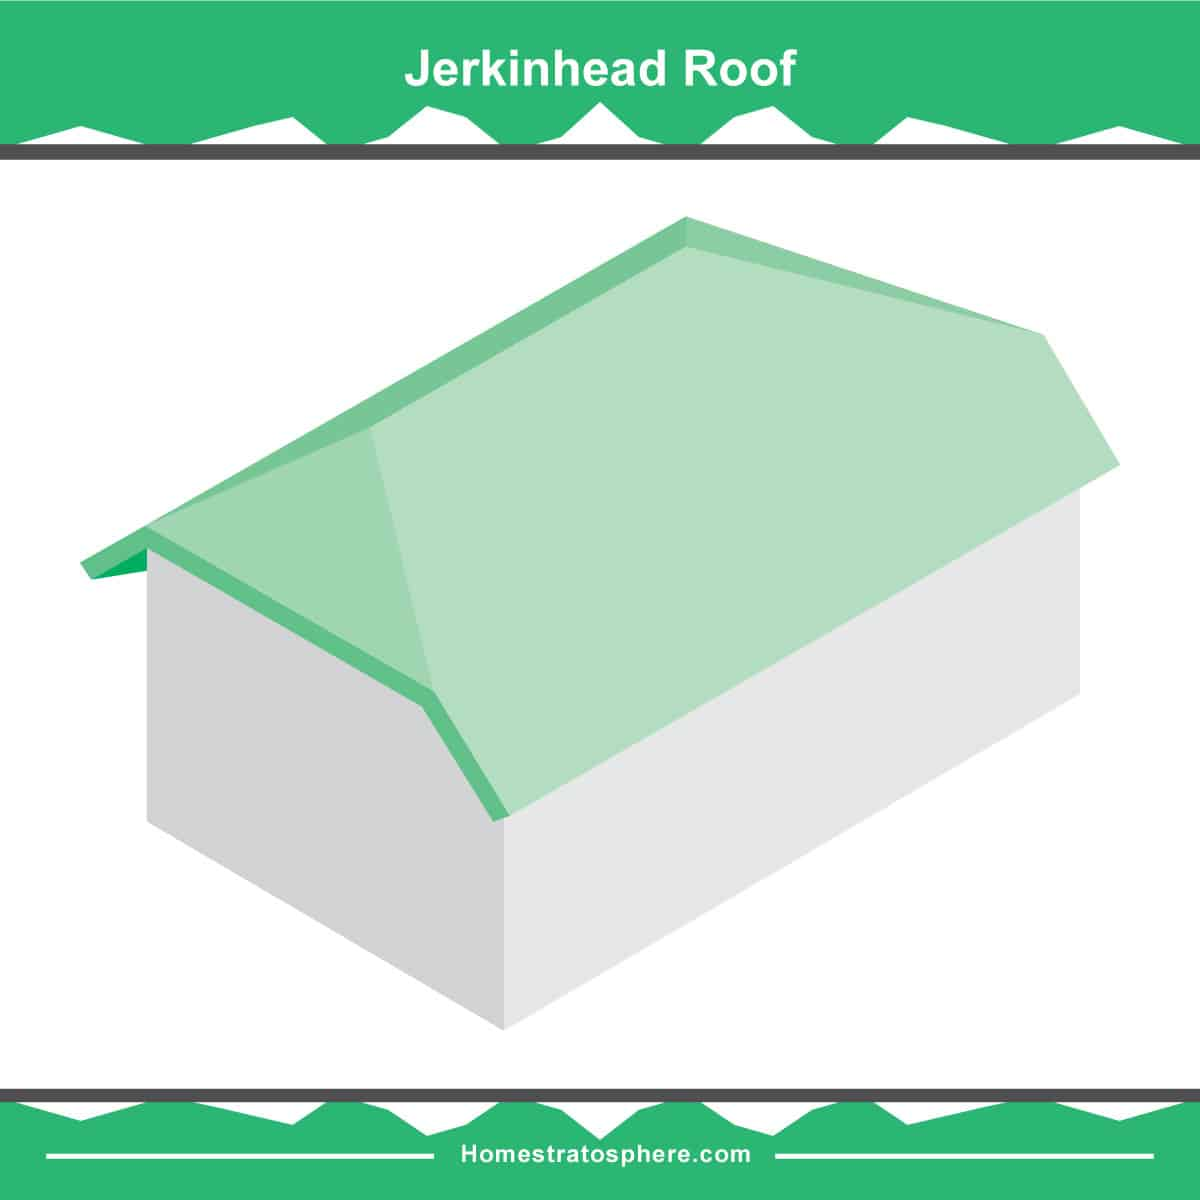 Jerkinhead roof roof diagram